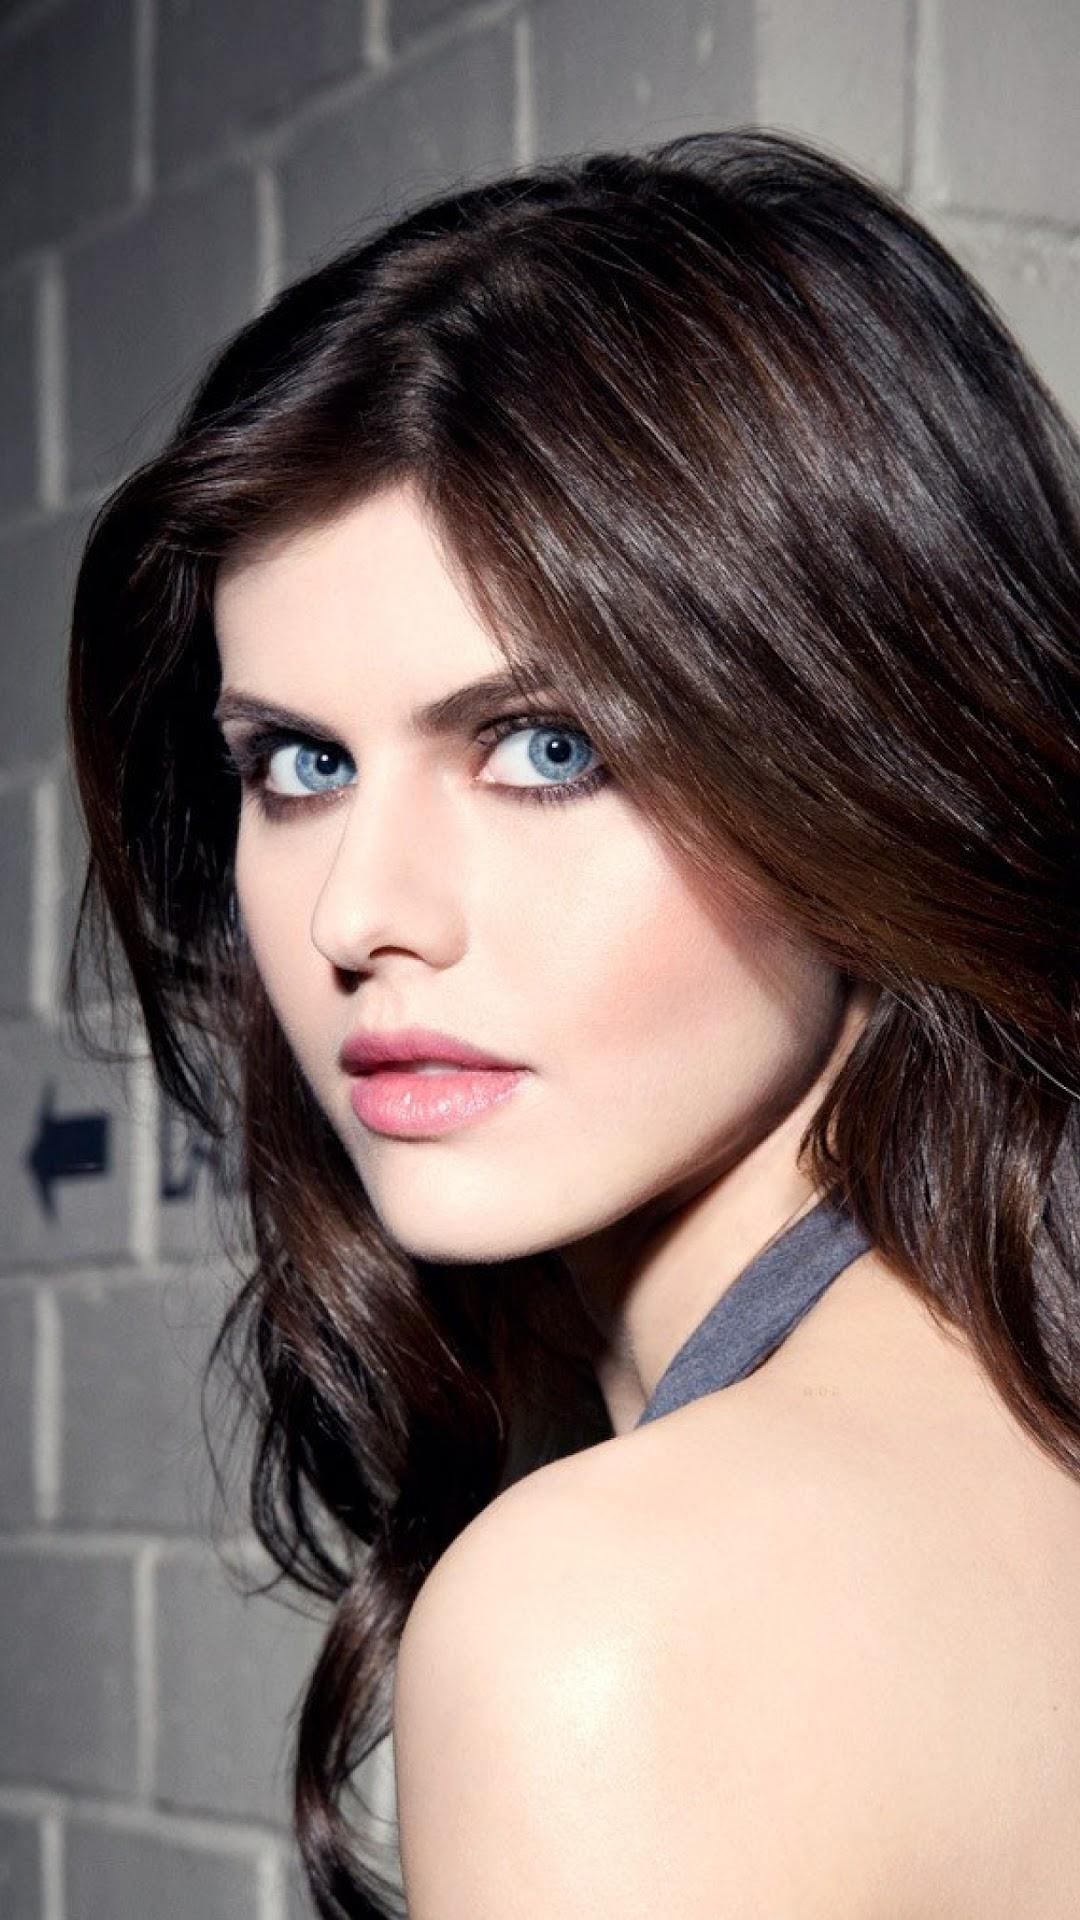 Alexandra Daddario Beautiful Girl 4k 3840x2160 Wallpaper 12